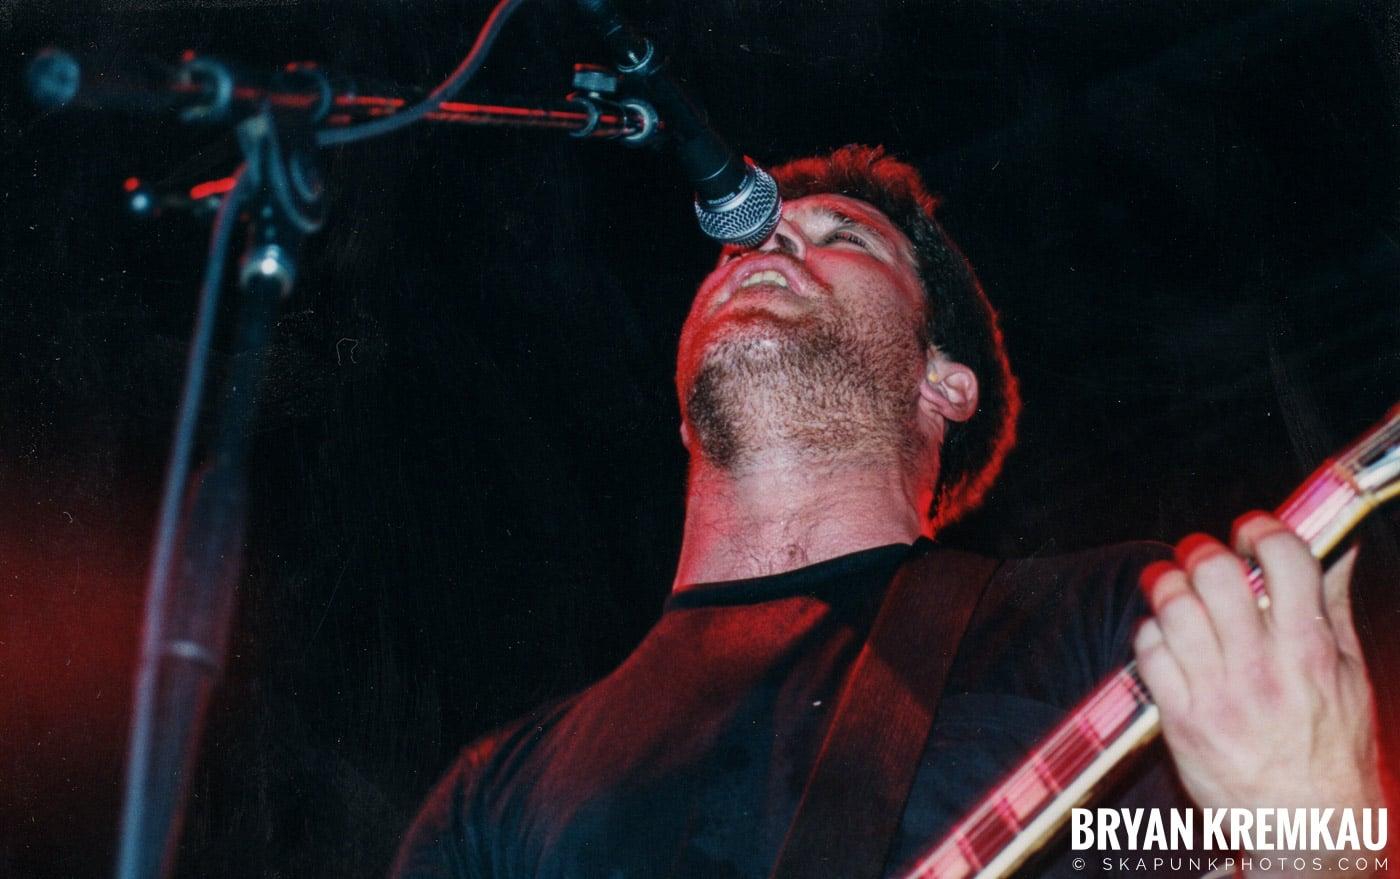 Hot Water Music @ Roseland, NYC - 3.12.02 (10)